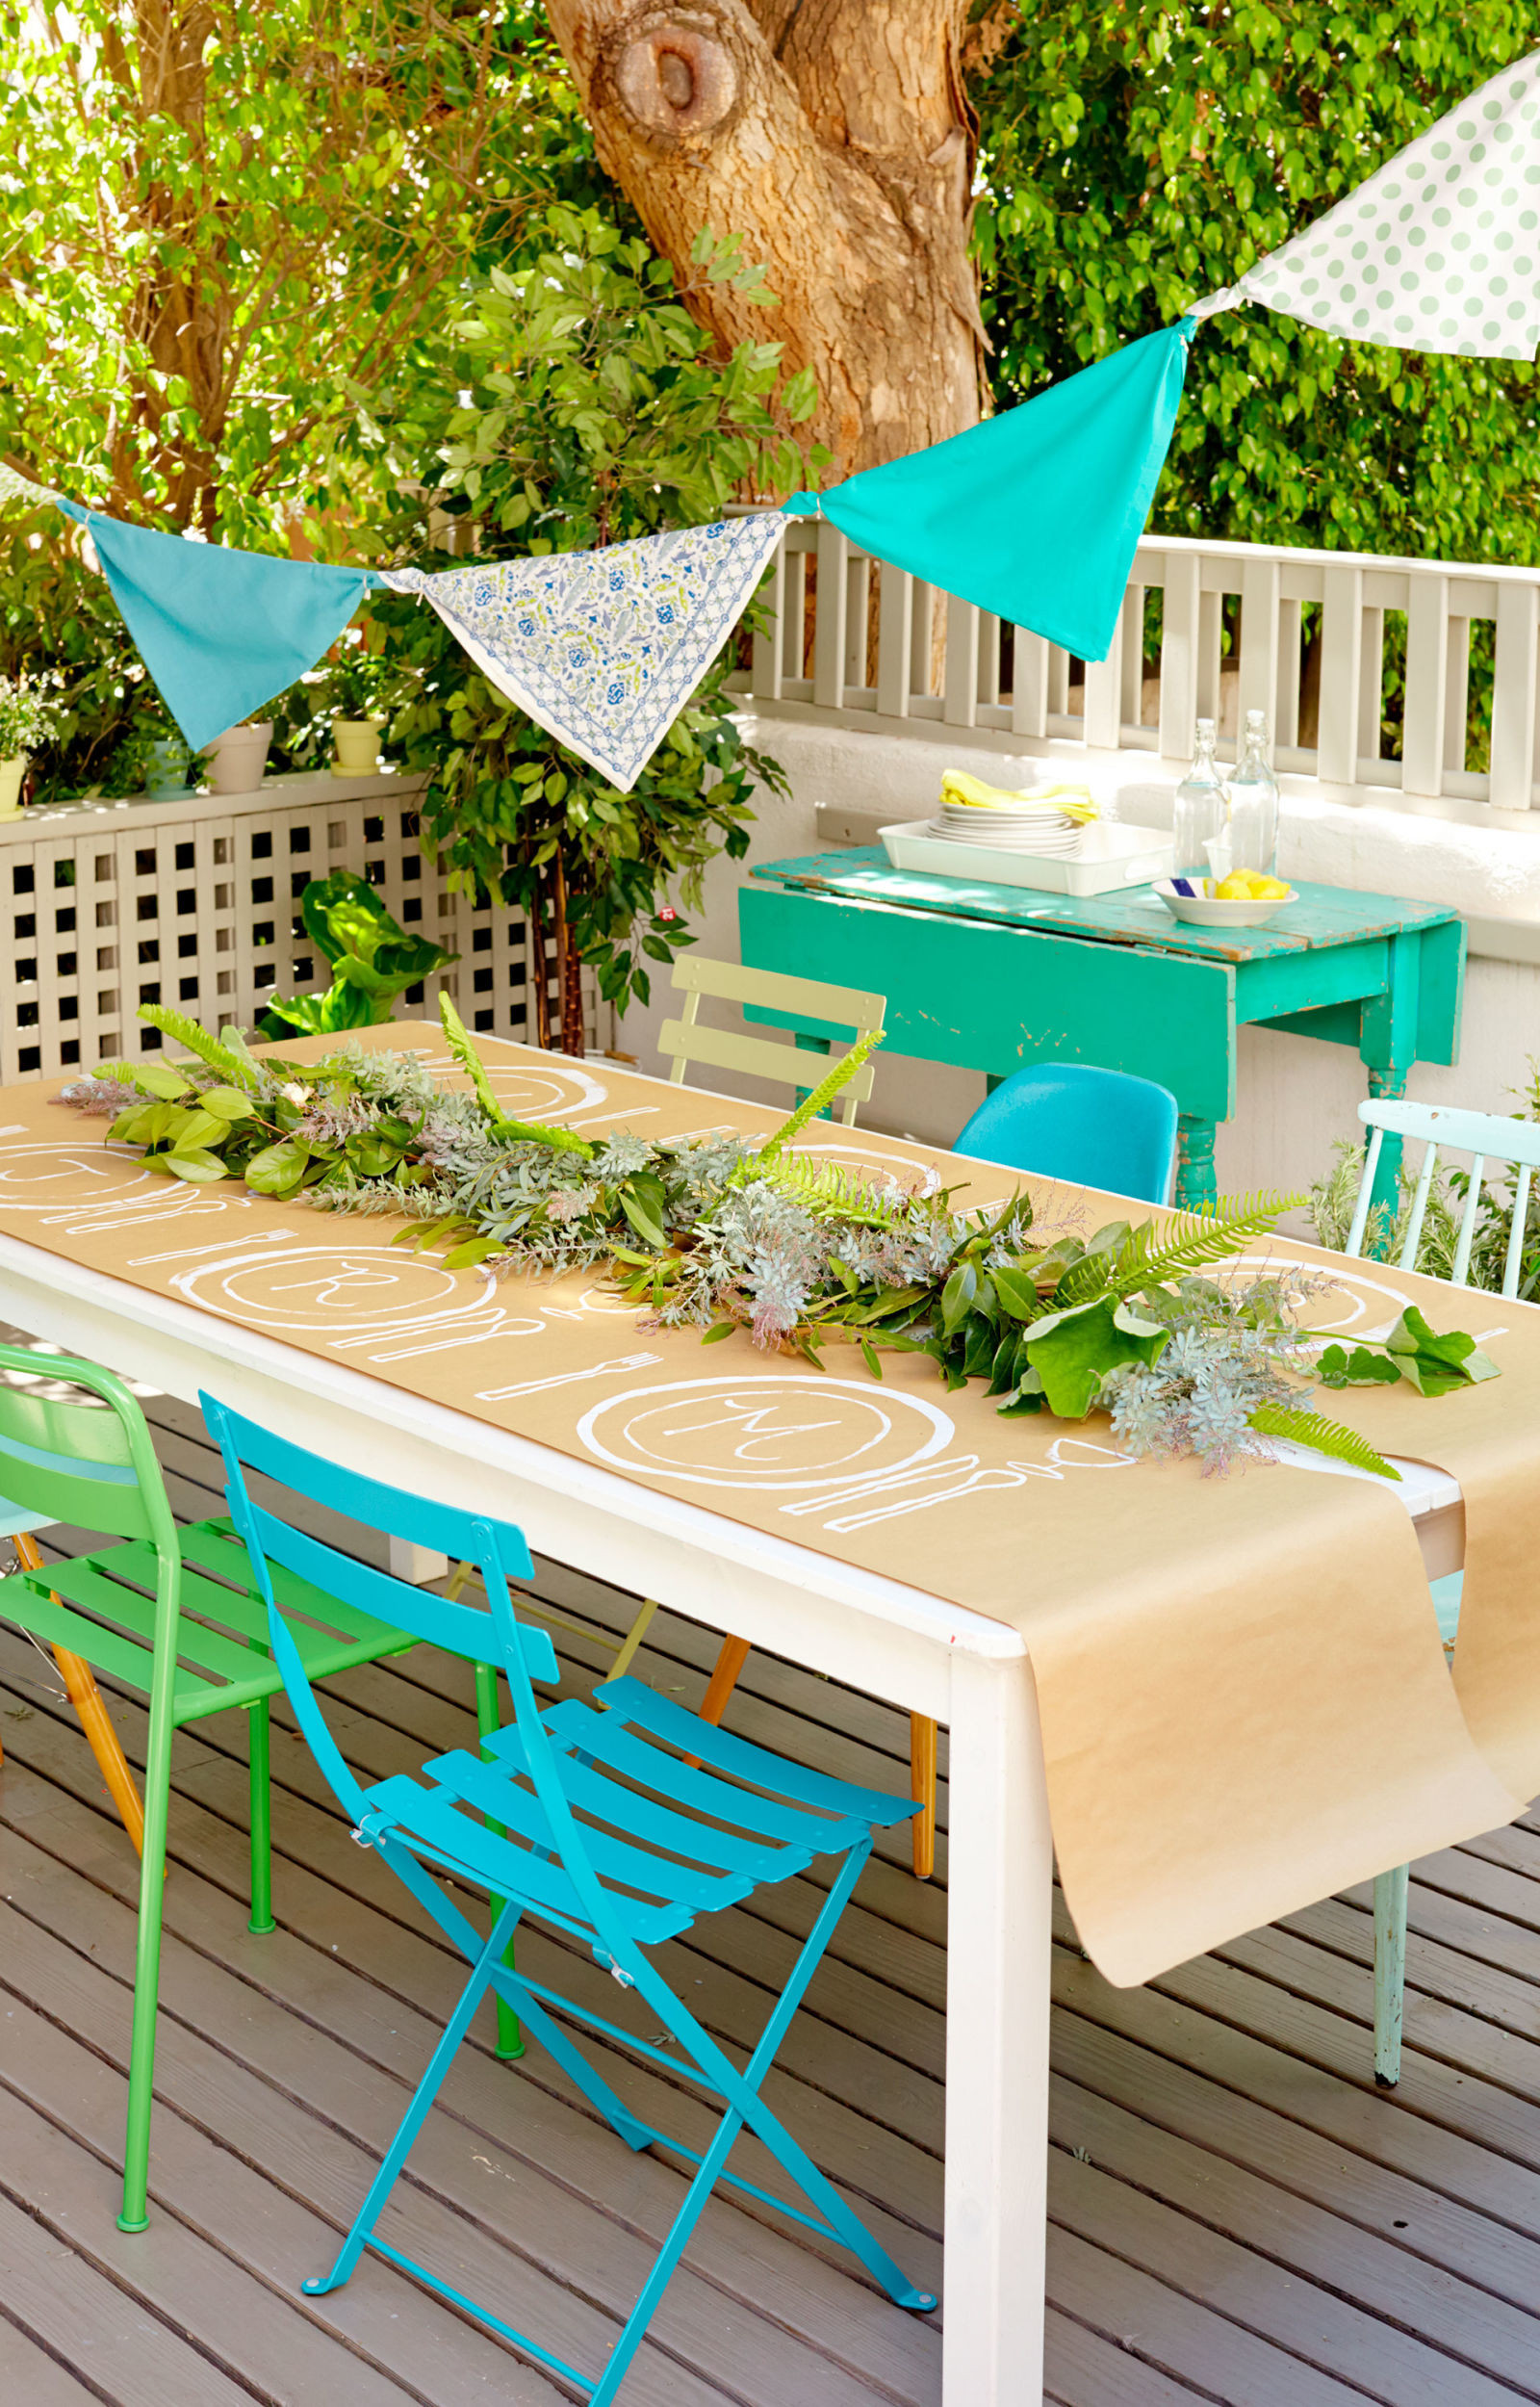 Ideas For Backyard Party  Backyard Party Ideas And Decor Summer Entertaining Ideas